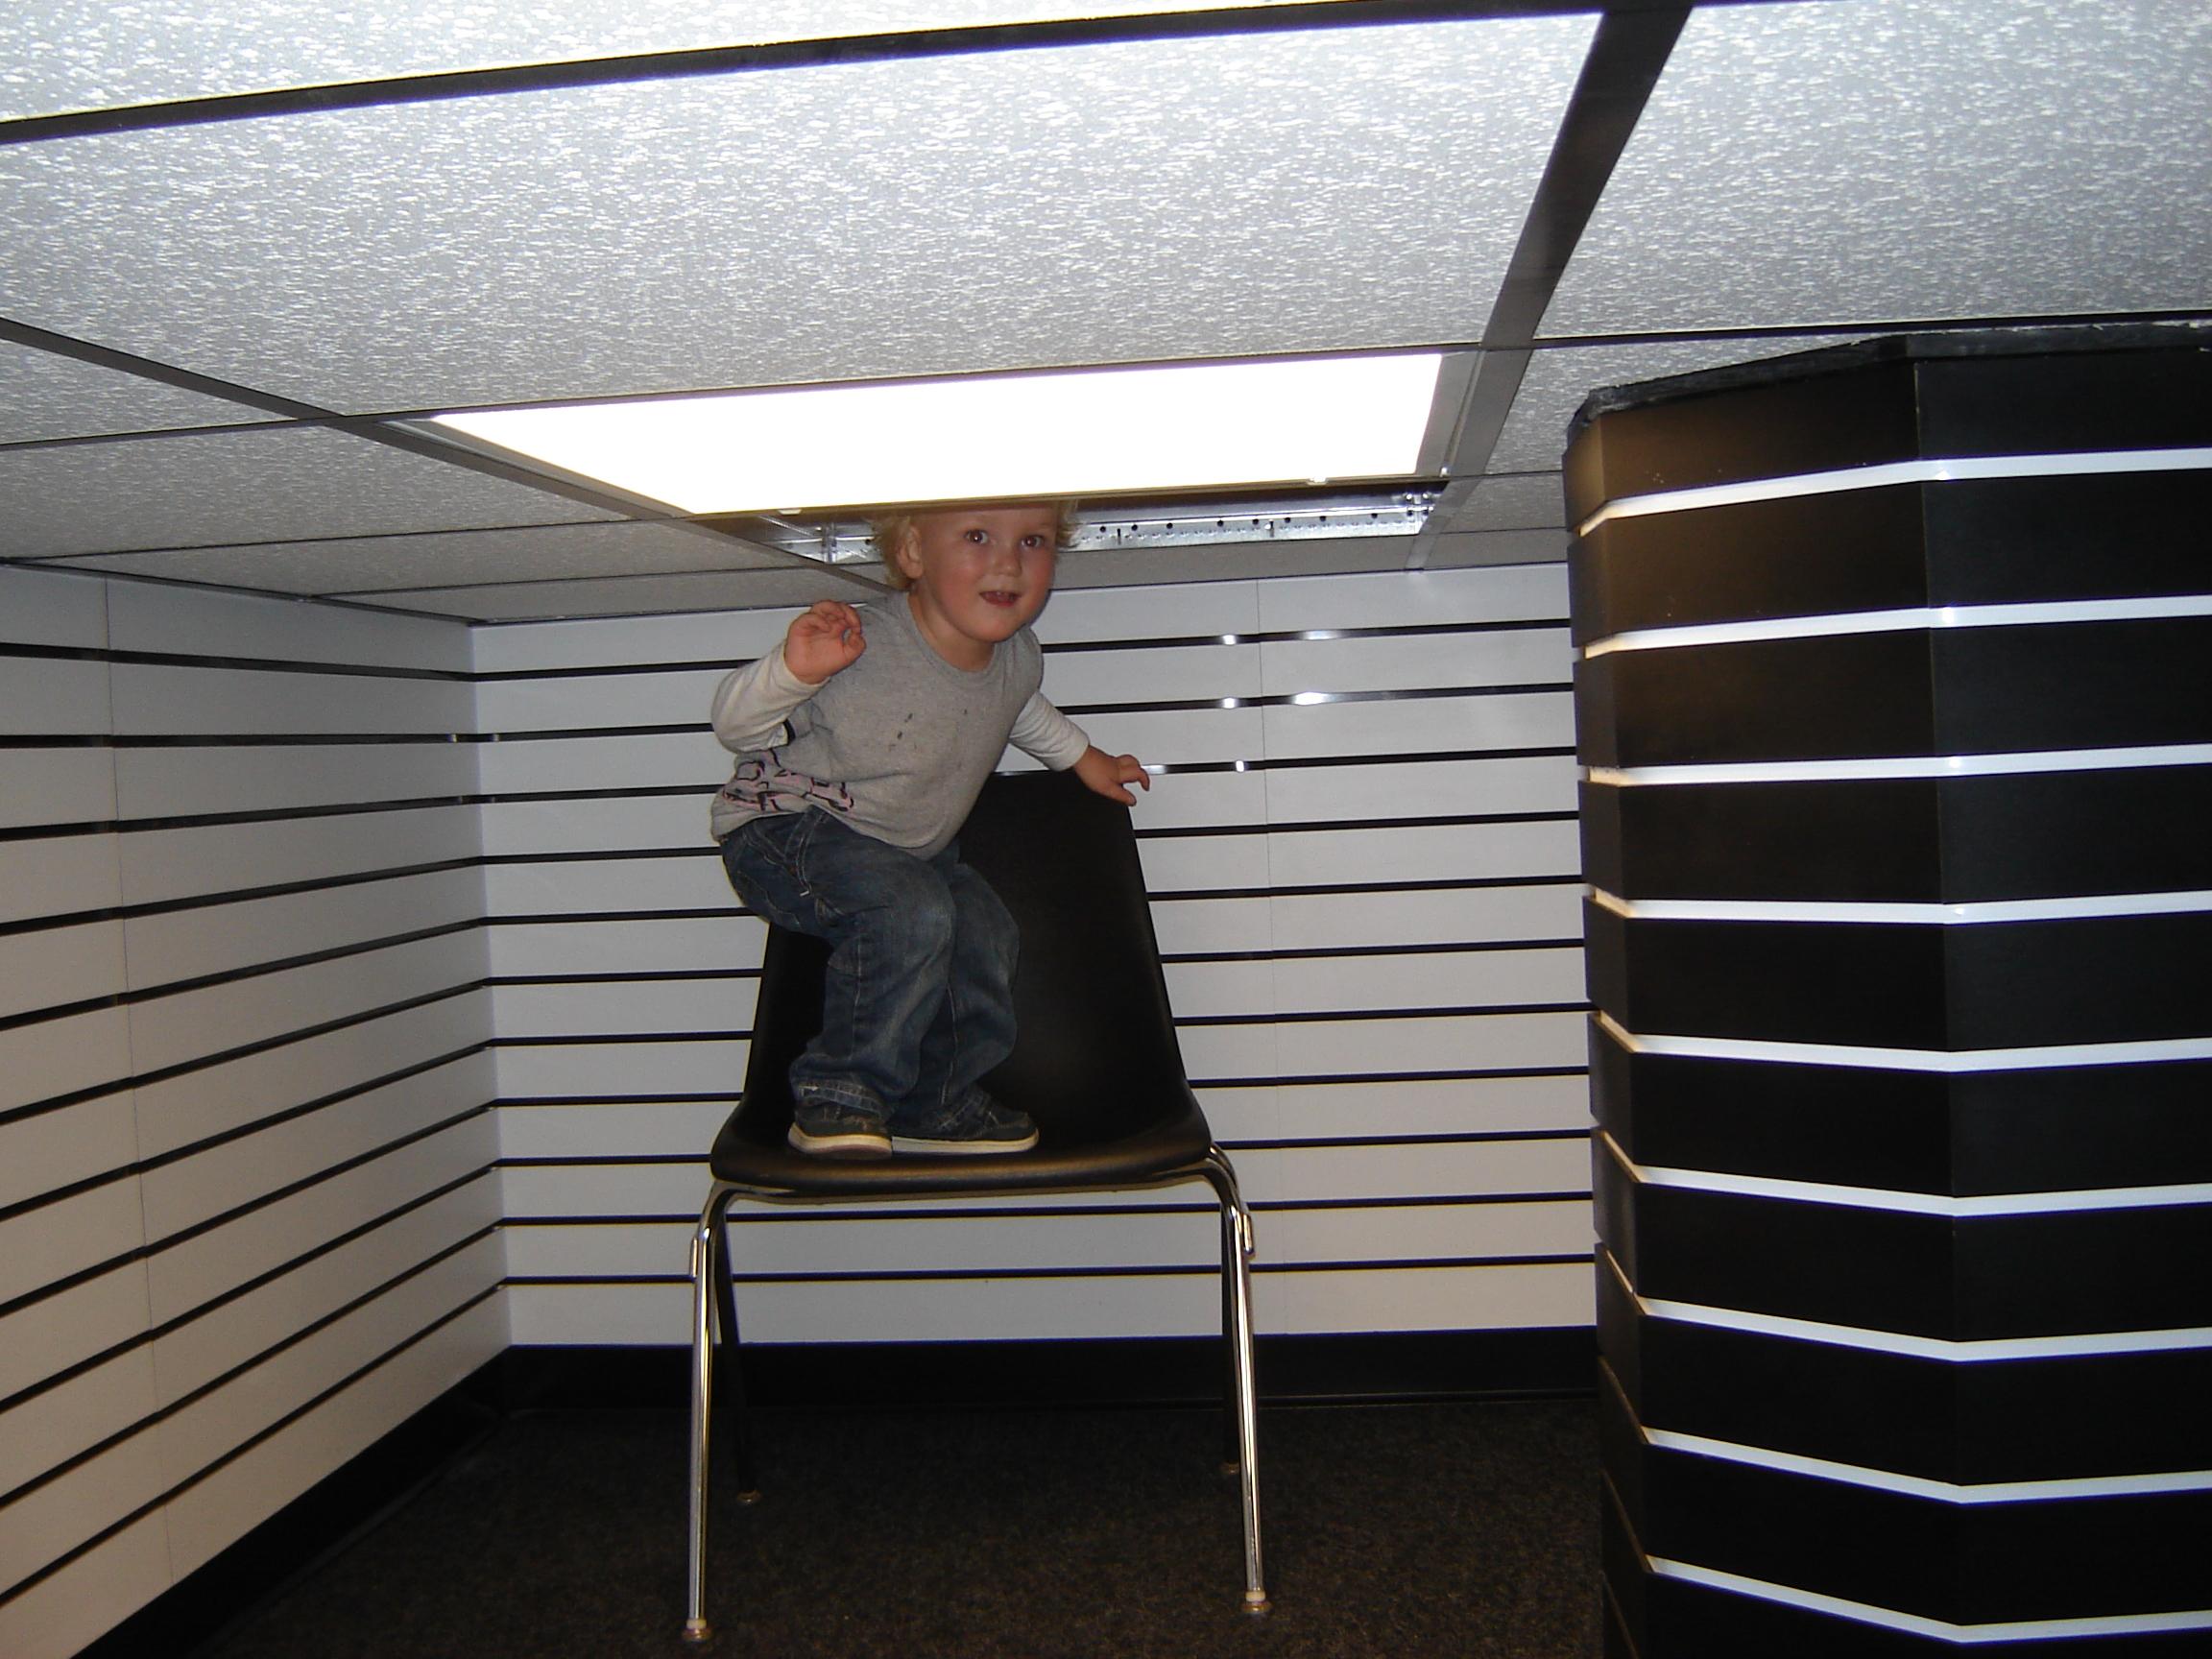 Drop Ceiling No. 3 (Dark Store),  Anneka Herre, 2009.